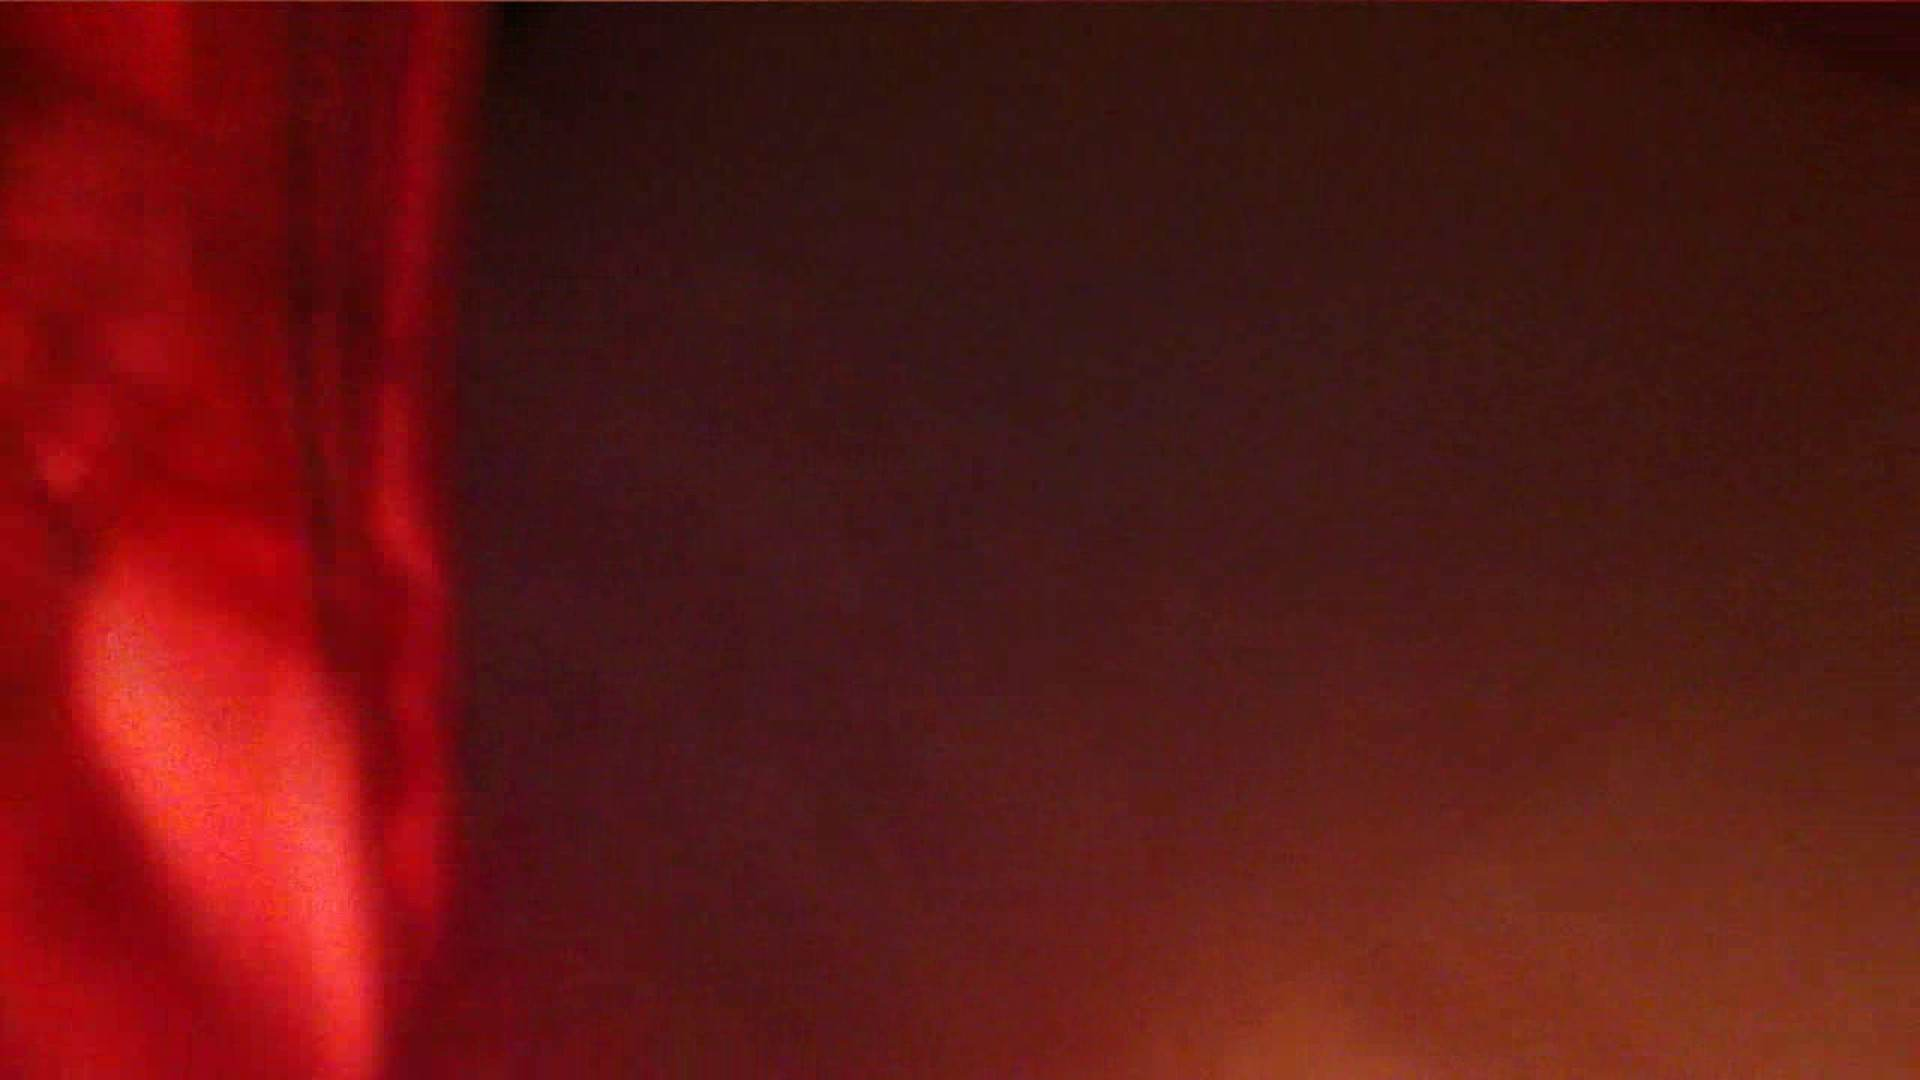 vol.36 美人アパレル胸チラ&パンチラ ポニテ(゚∀゚)キタコレ!! パンチラ 戯れ無修正画像 104画像 21